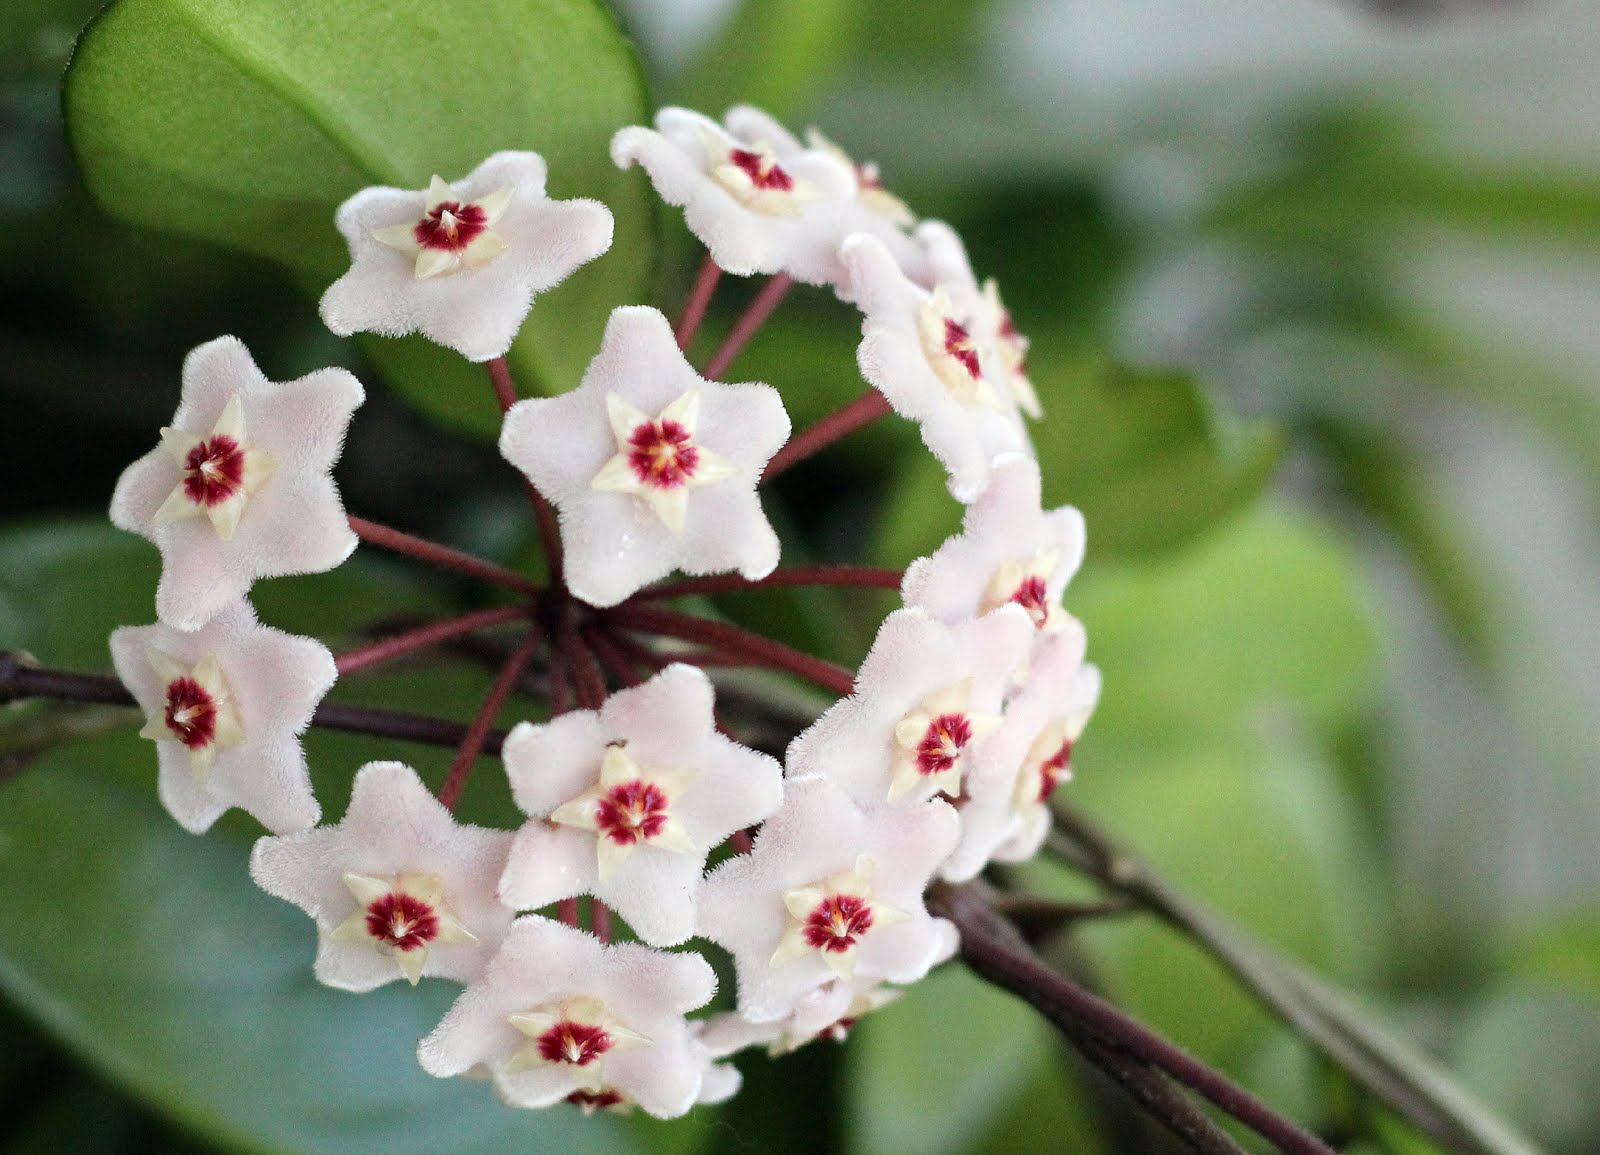 Blooming Hoya Grateful Prayer Thankful Heart